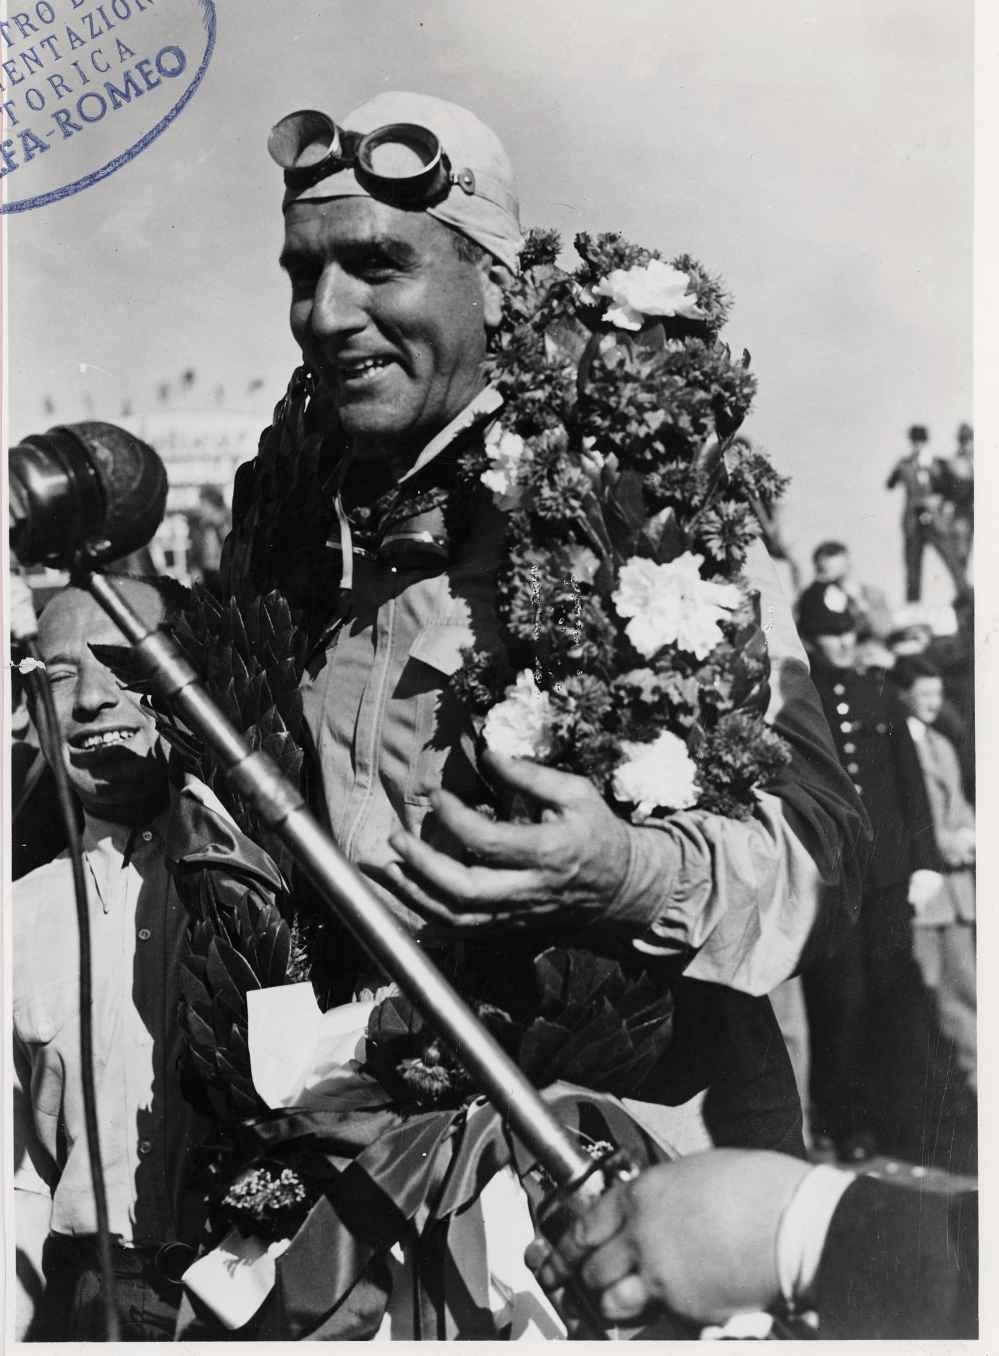 GP von Silverstone 1950: Nino Farina Sieg im Alfa Romeo 158